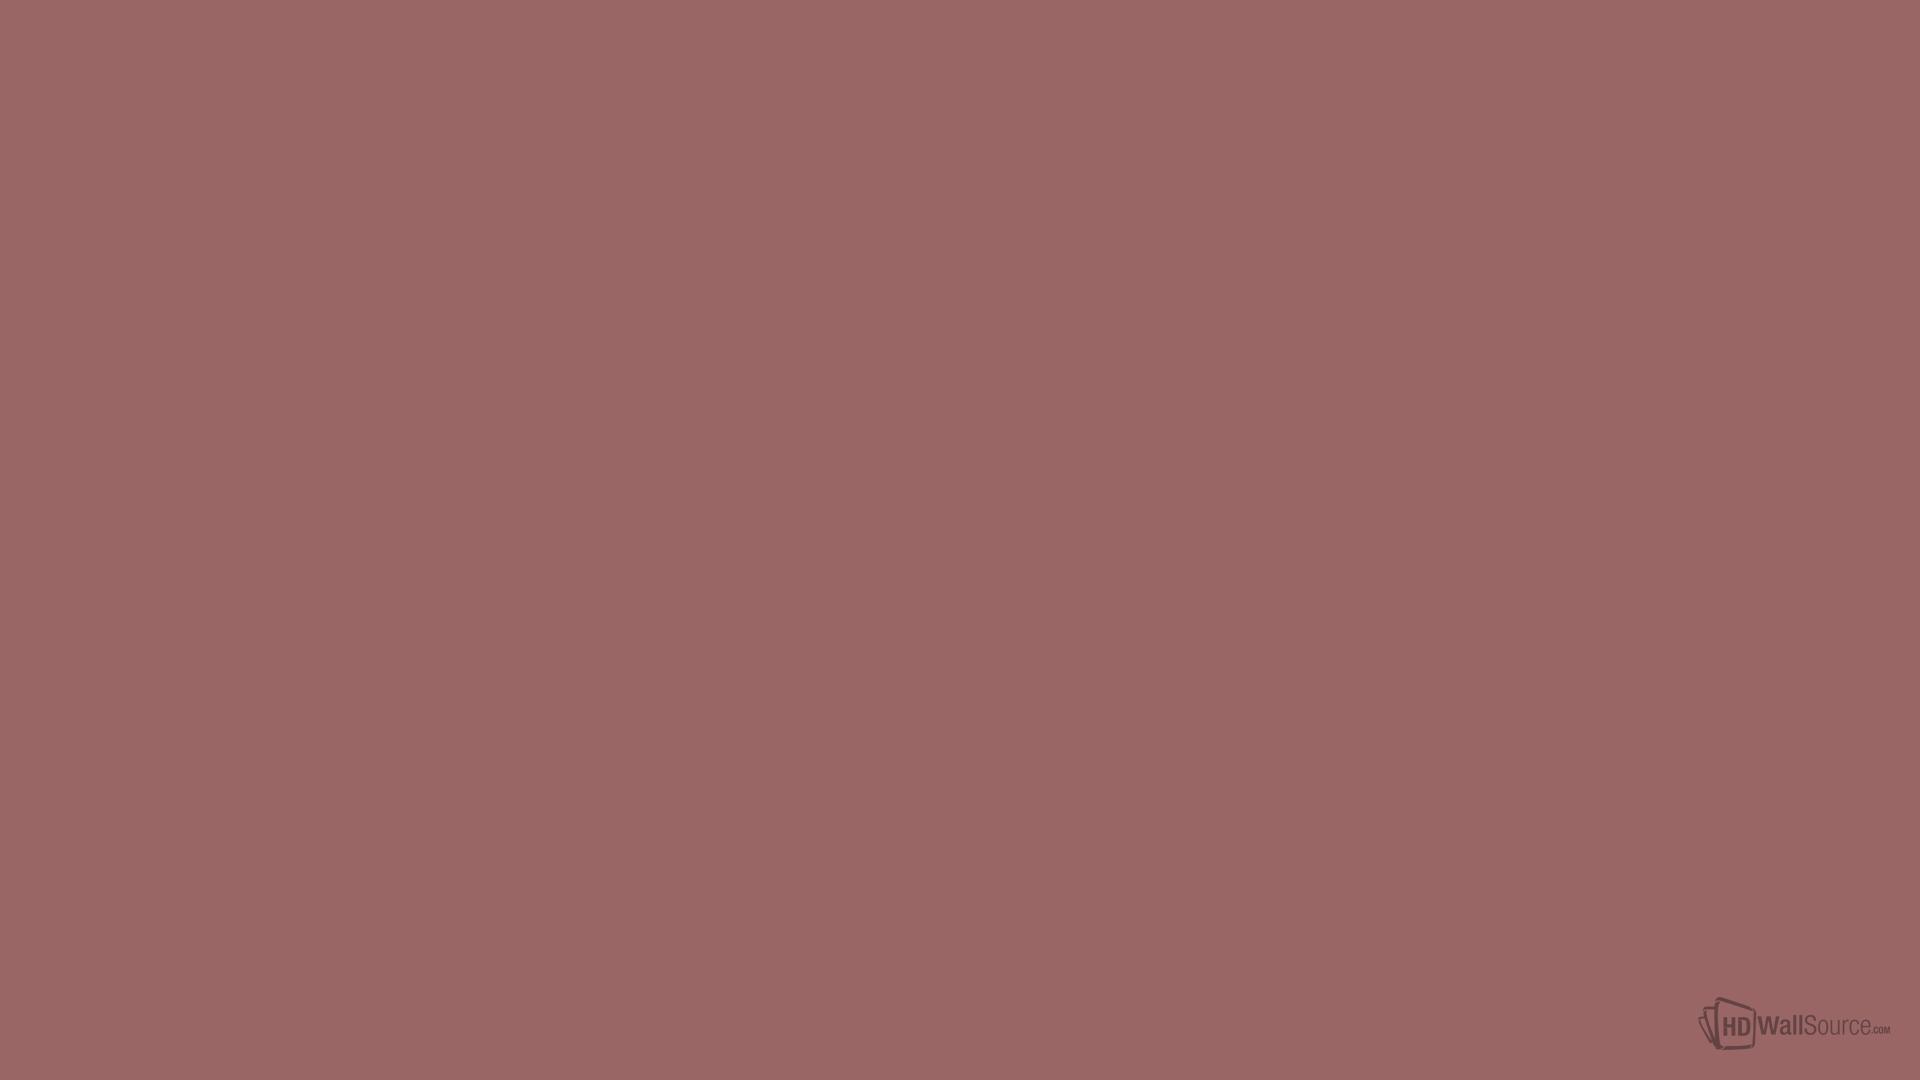 996666 wallpaper 71054